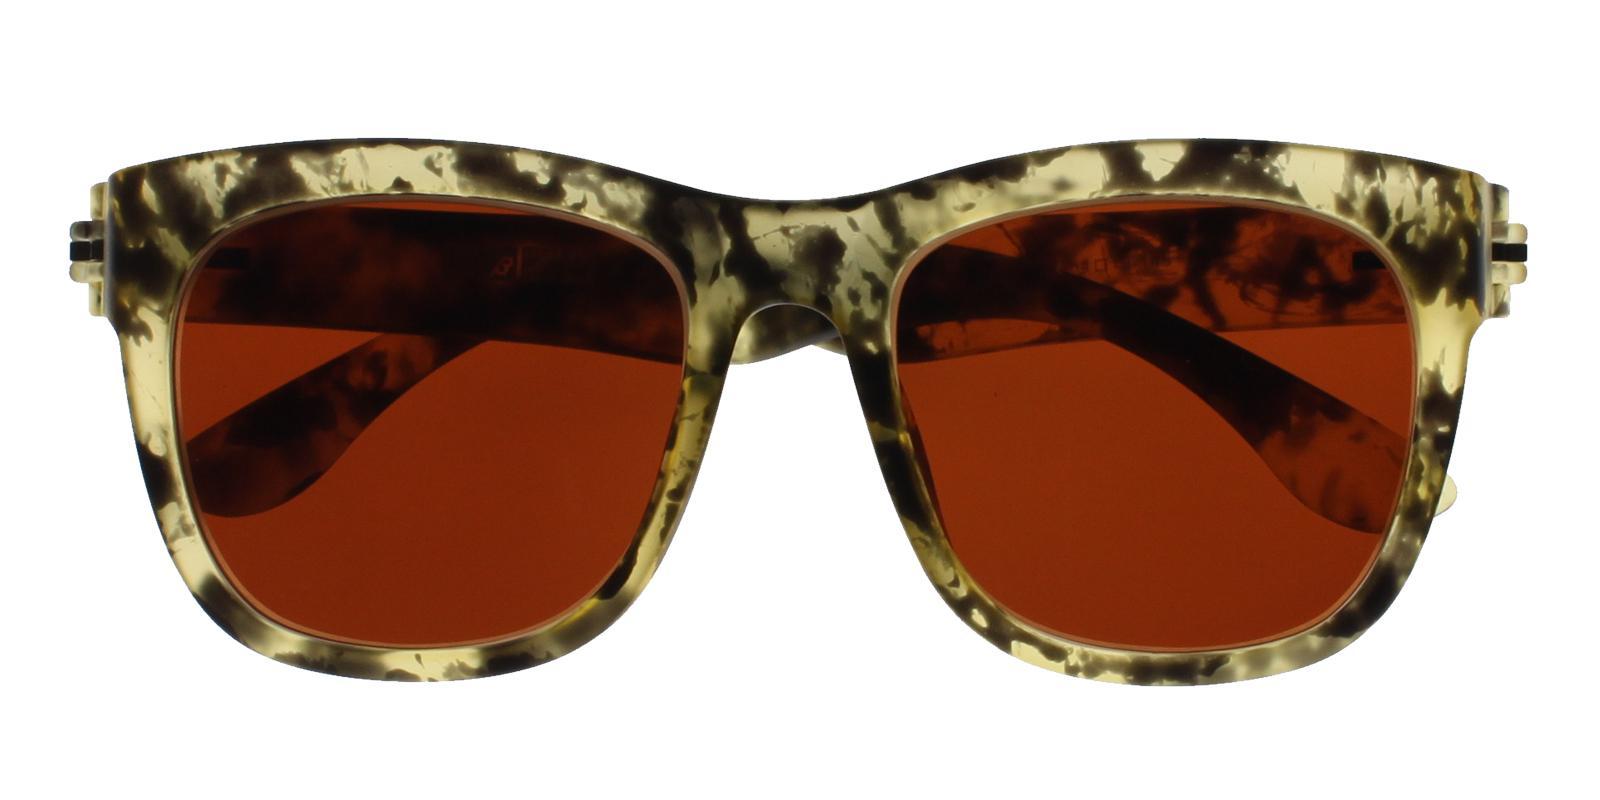 Satsuma Pattern TR Sunglasses , UniversalBridgeFit Frames from ABBE Glasses